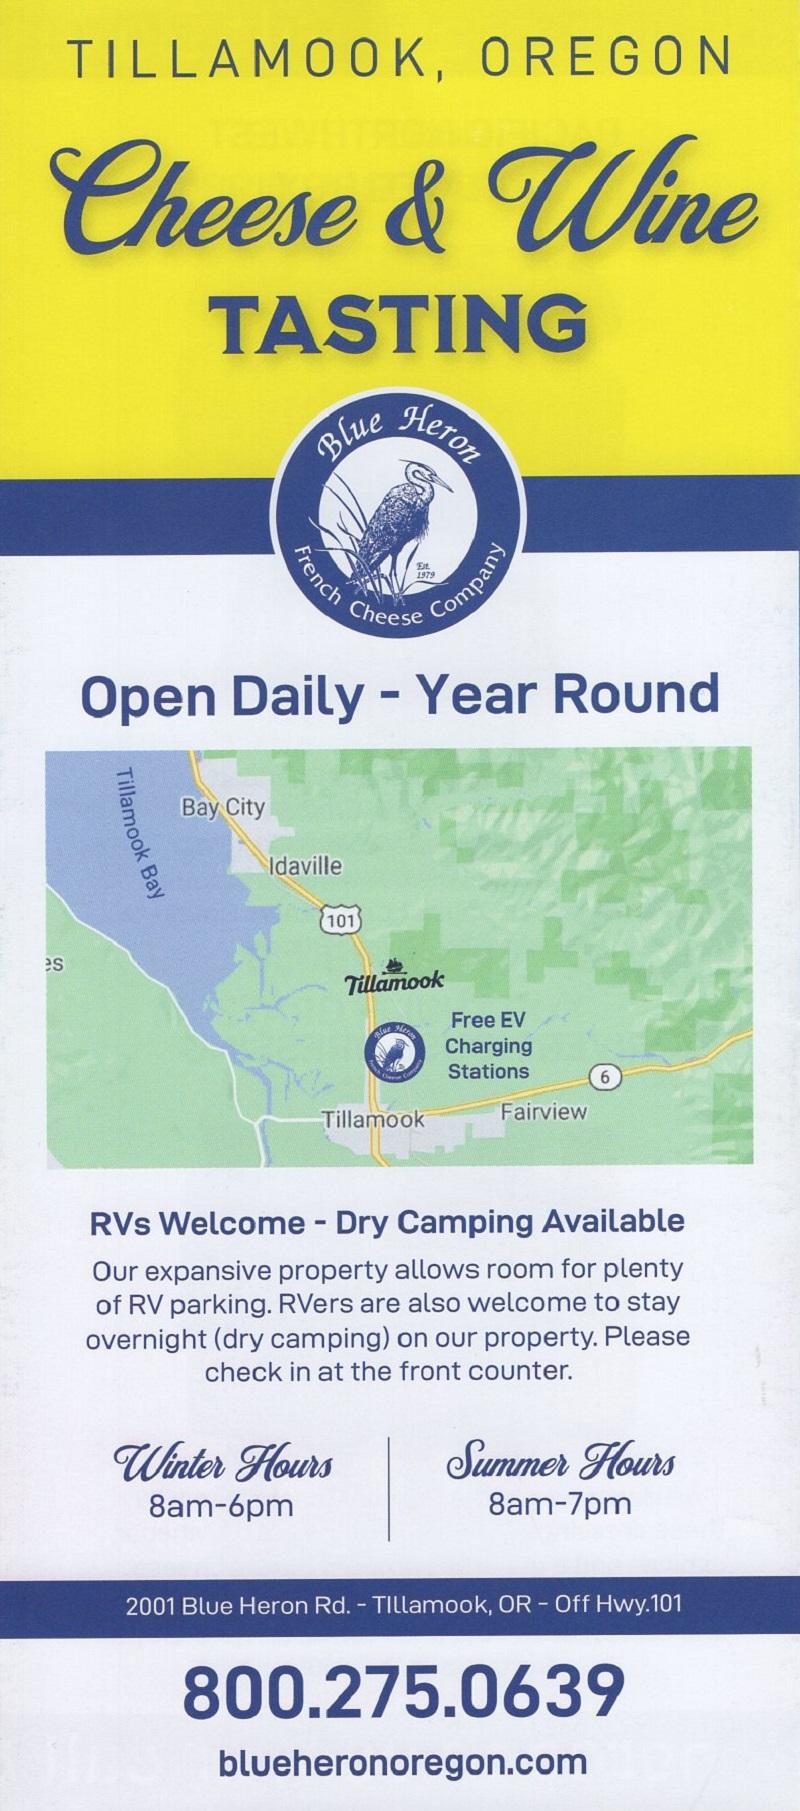 Visit the Blue Heron Cheese brochure thumbnail